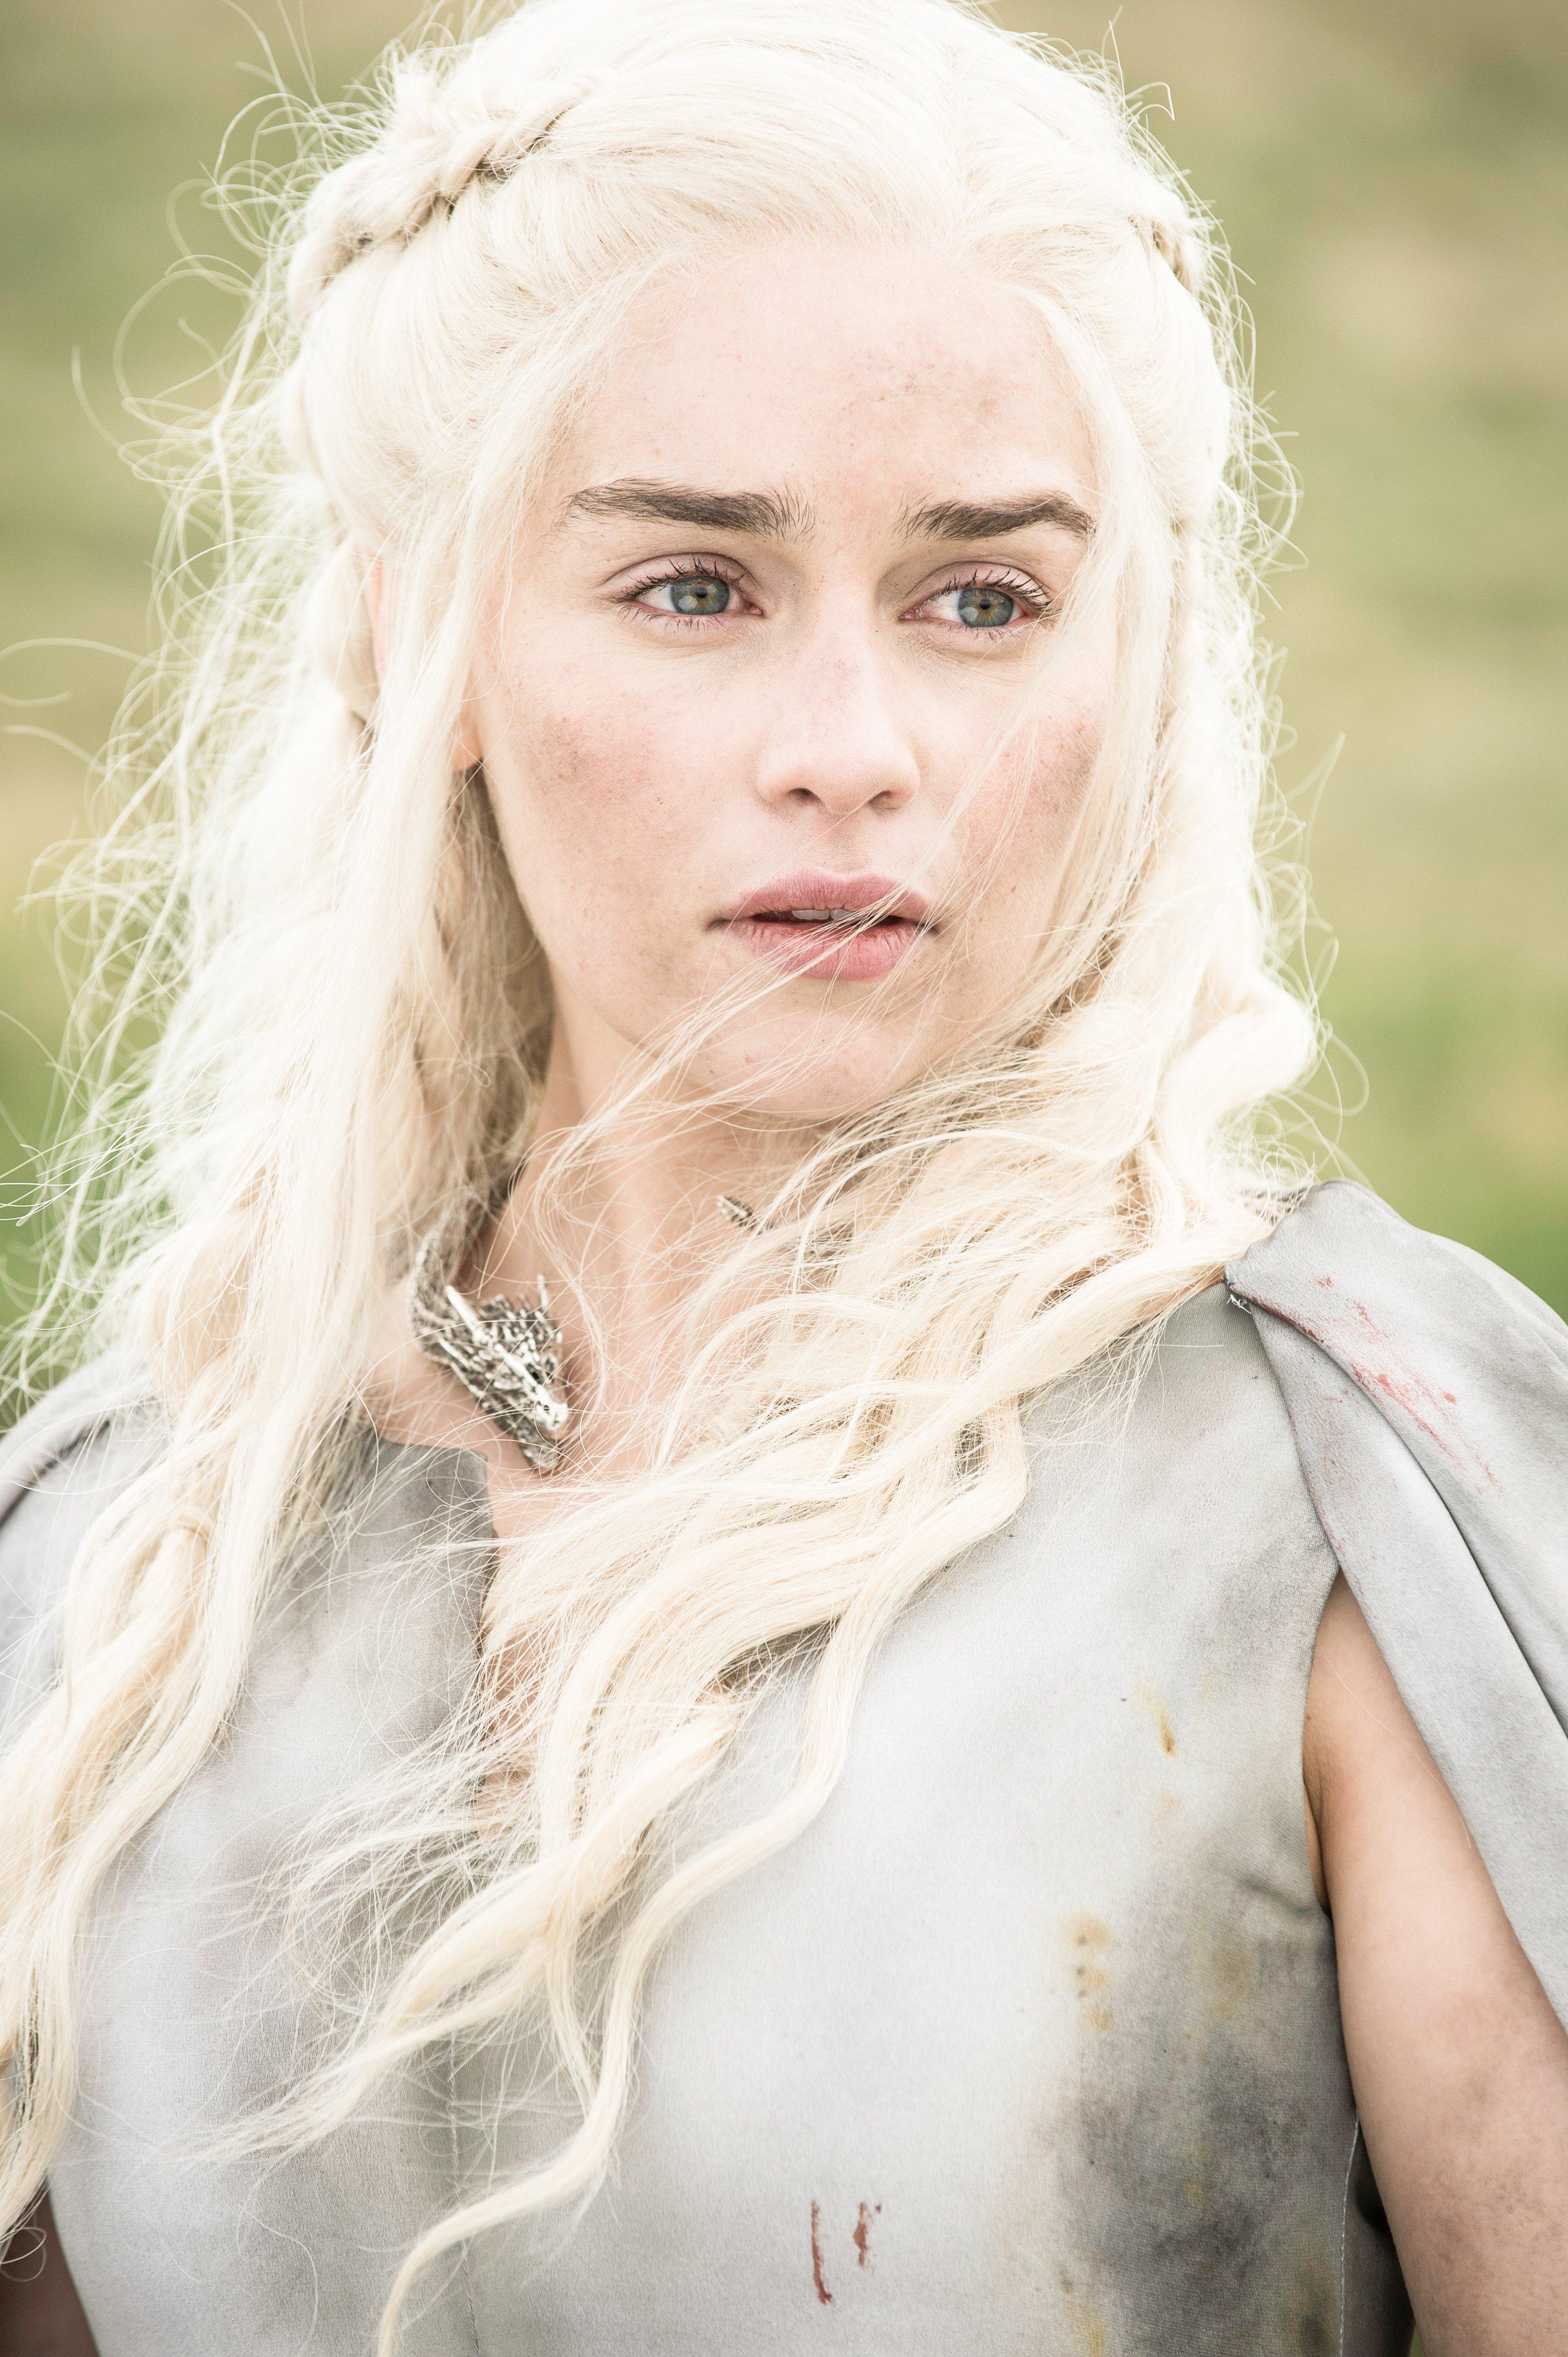 Fil:Daenerys-MothersMercy.jpg